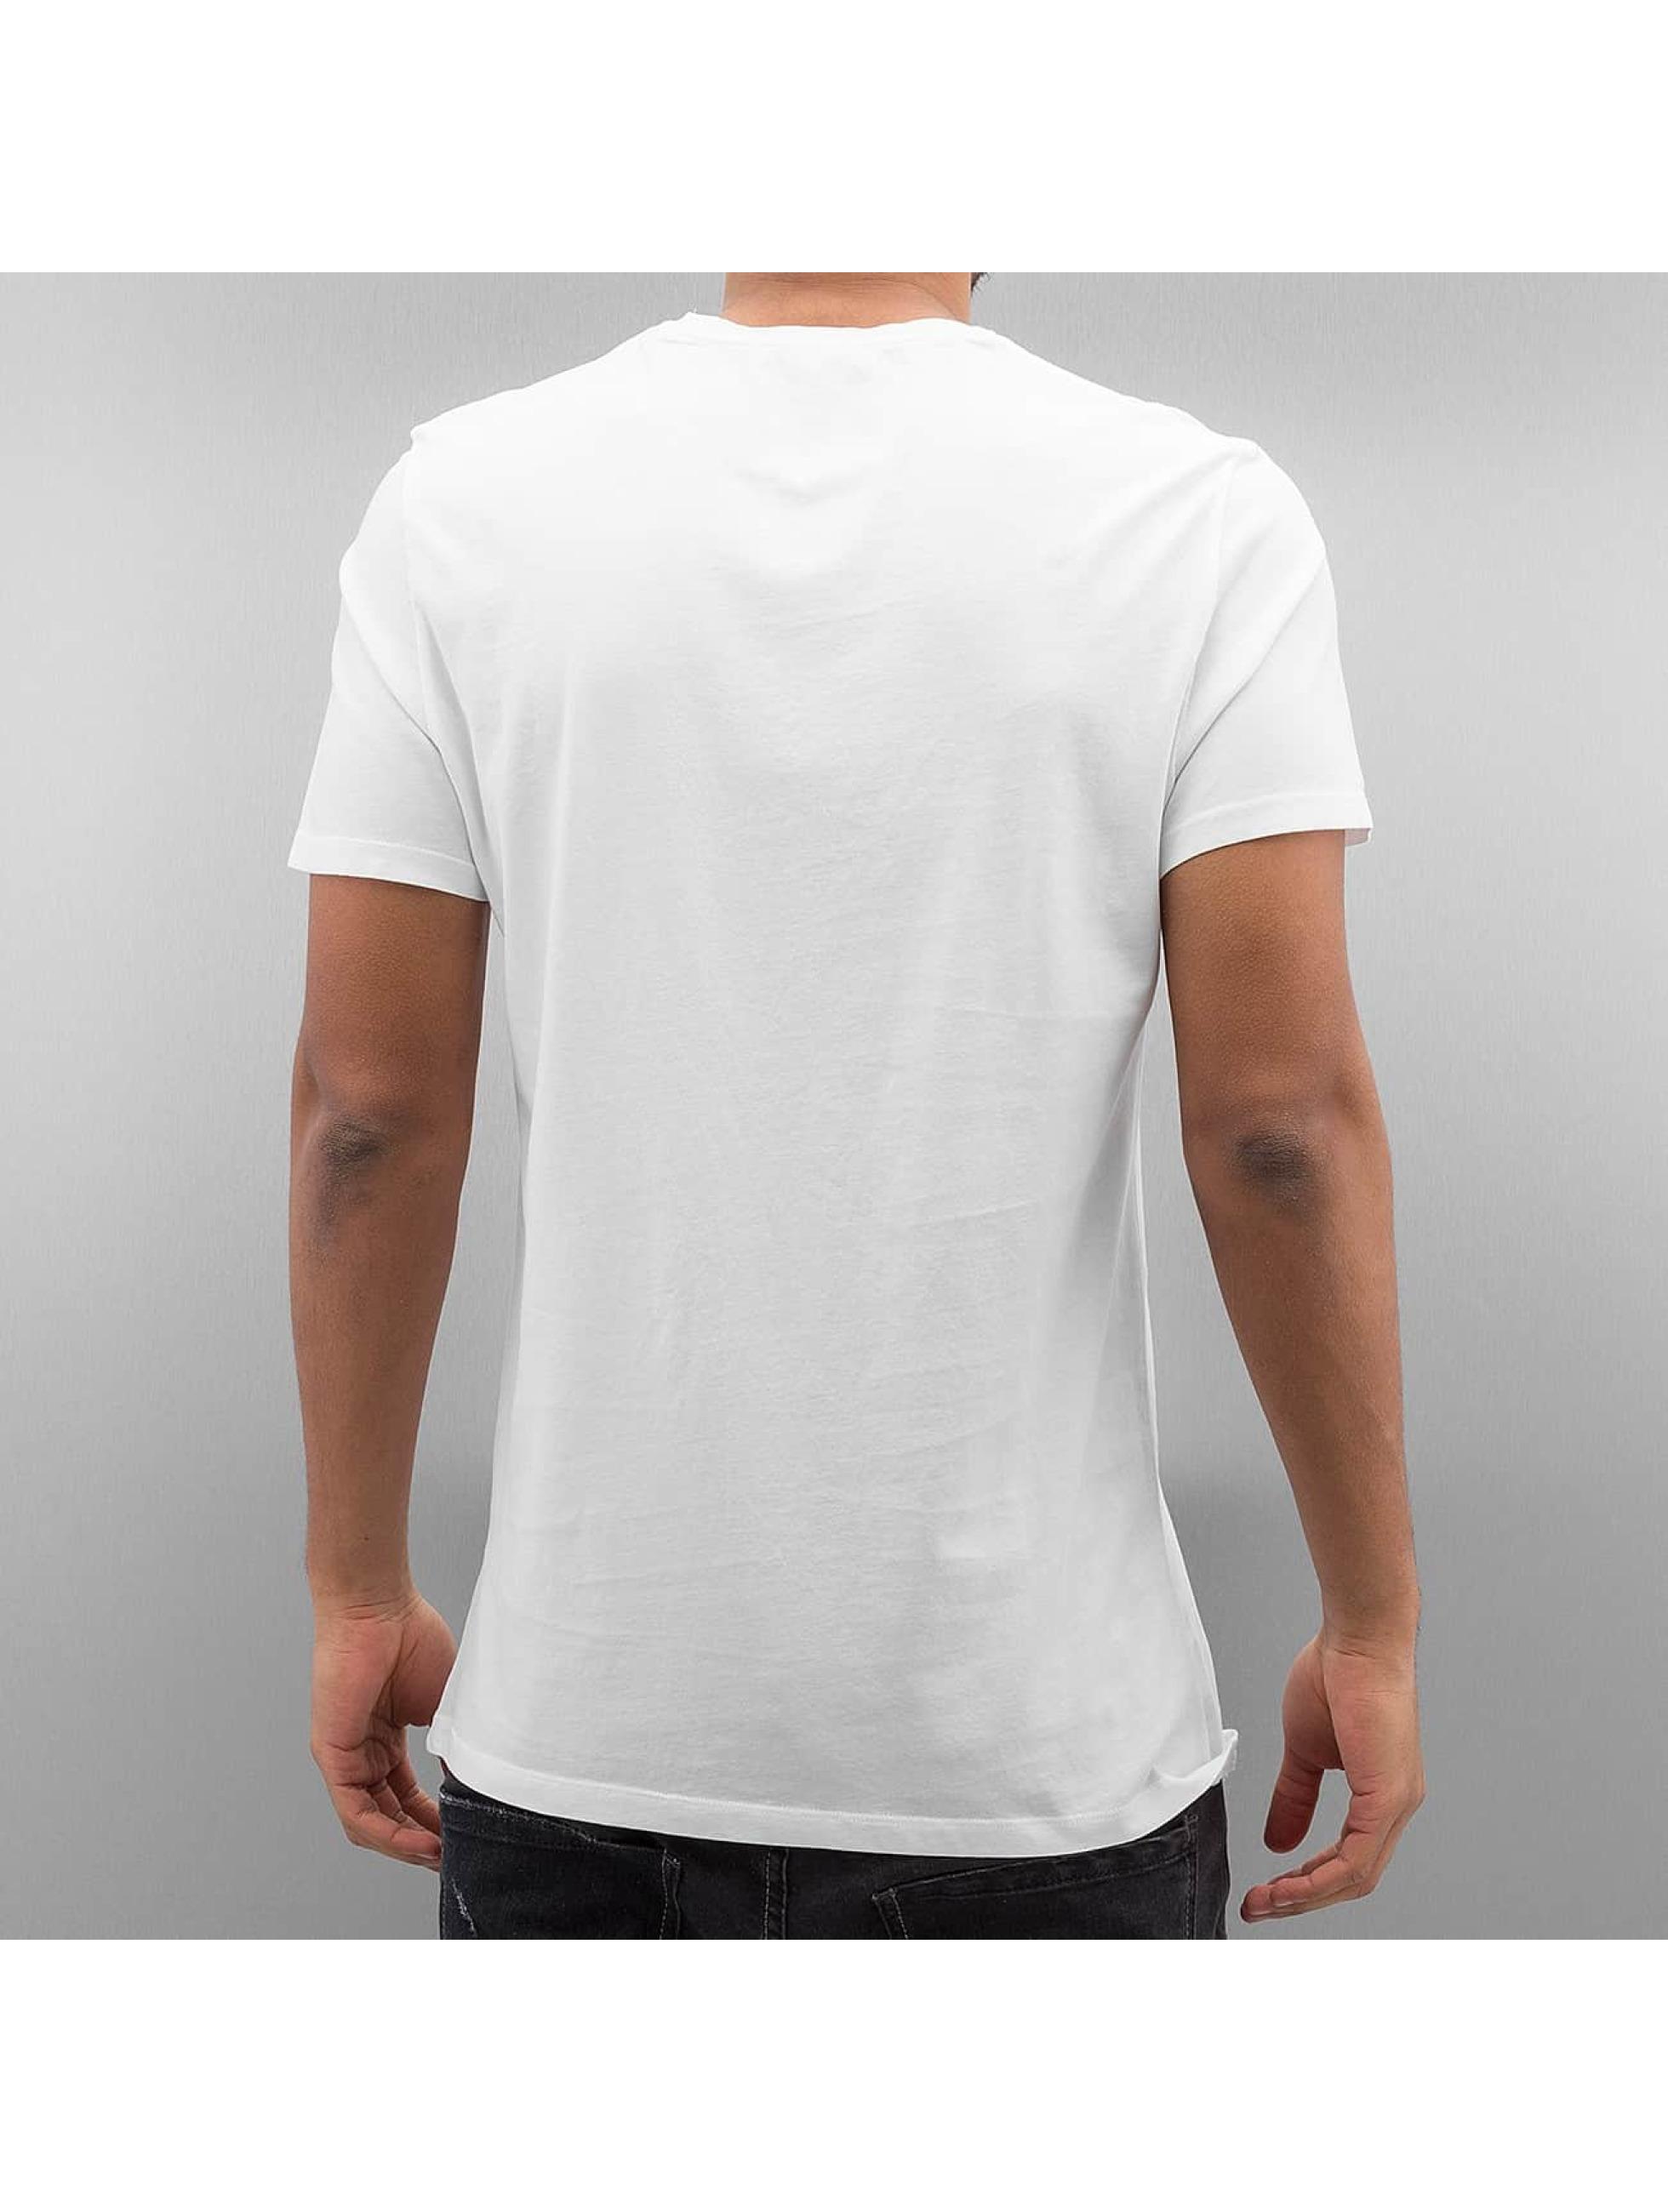 French Kick T-Shirt Olibrius white